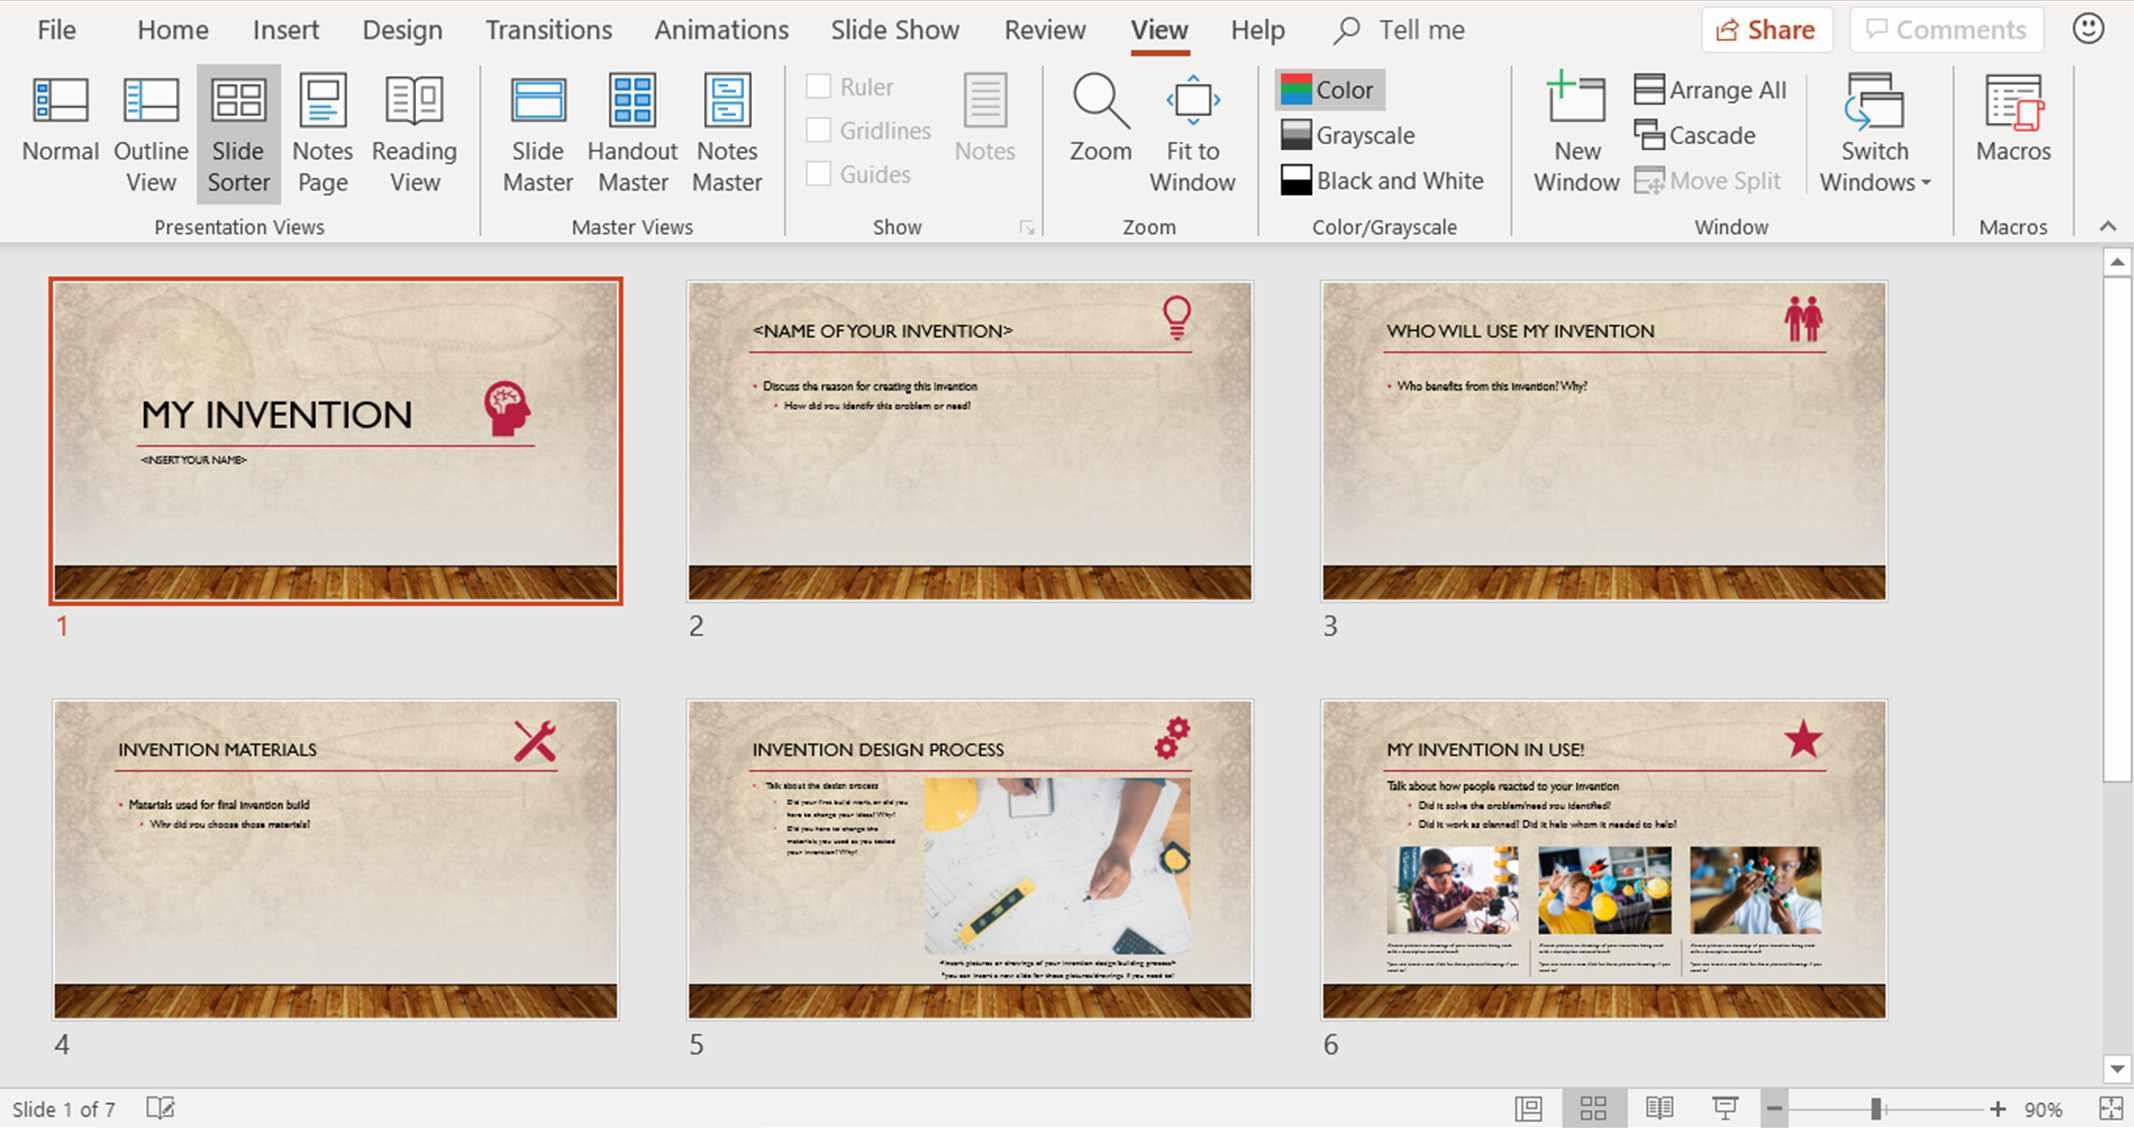 Screenshot showing Slide Sorter view in PowerPoint